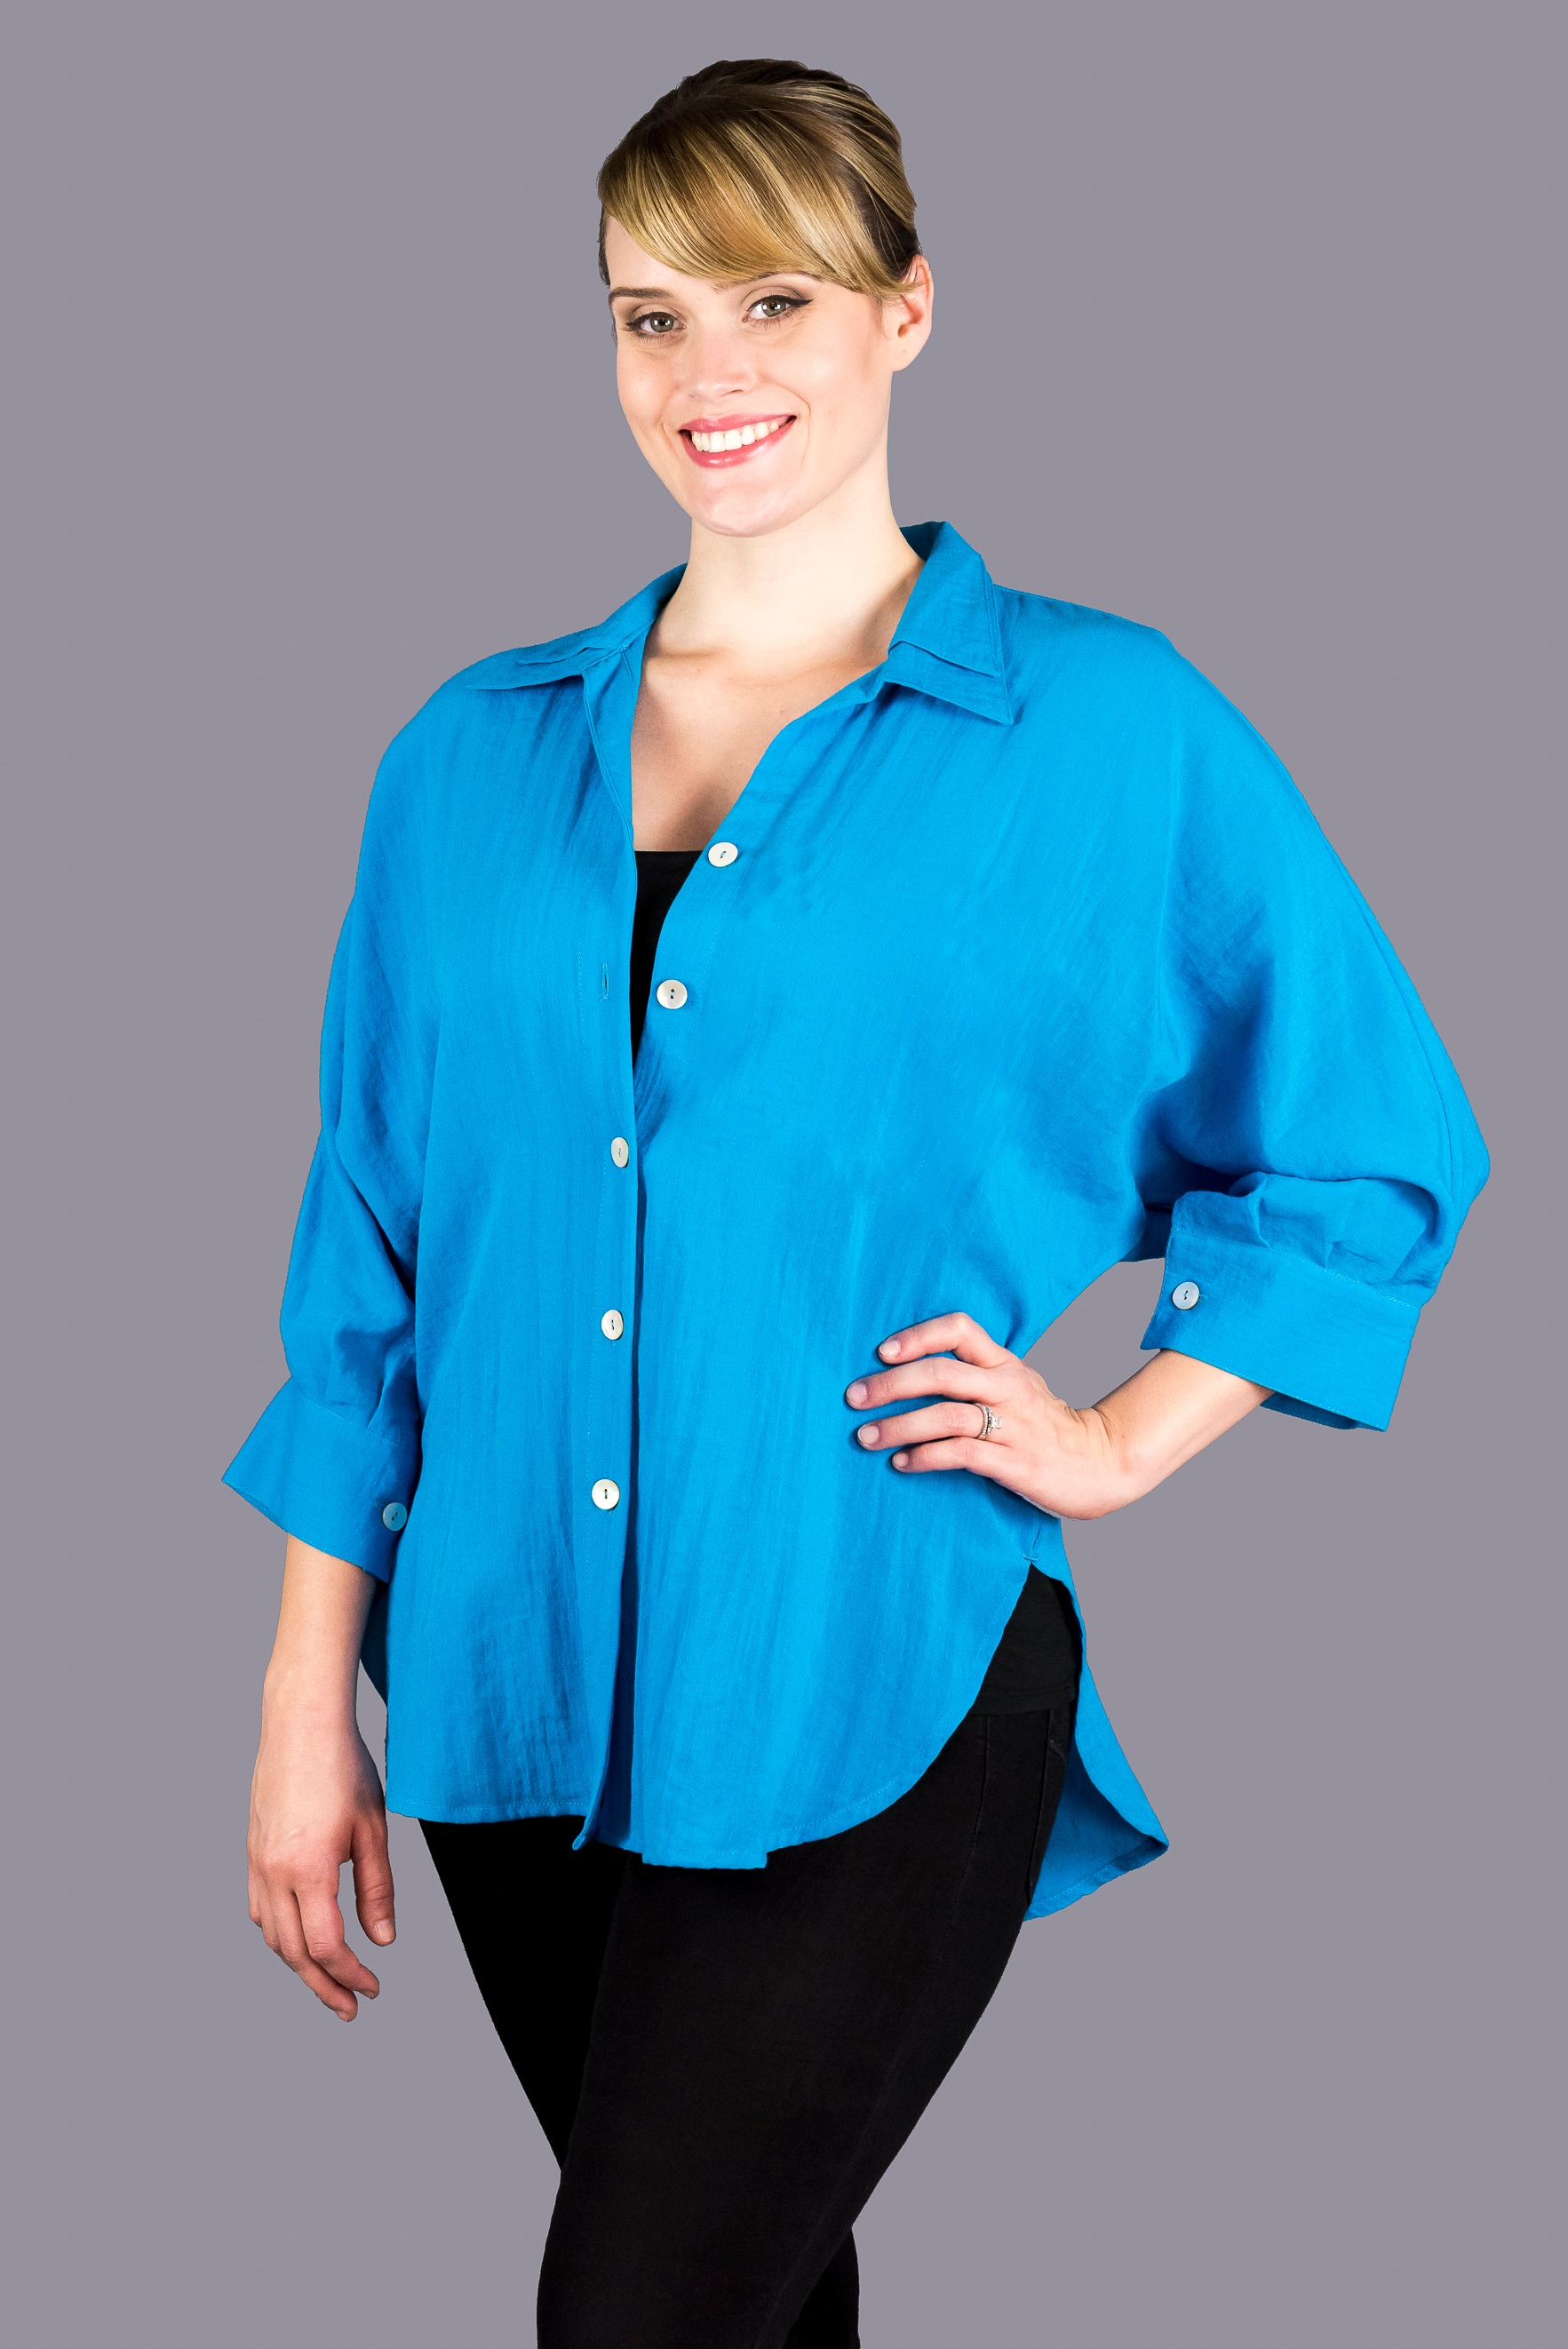 AA160 - Boyfriend Shirt w/ Double Flip Collar w/o Pocket